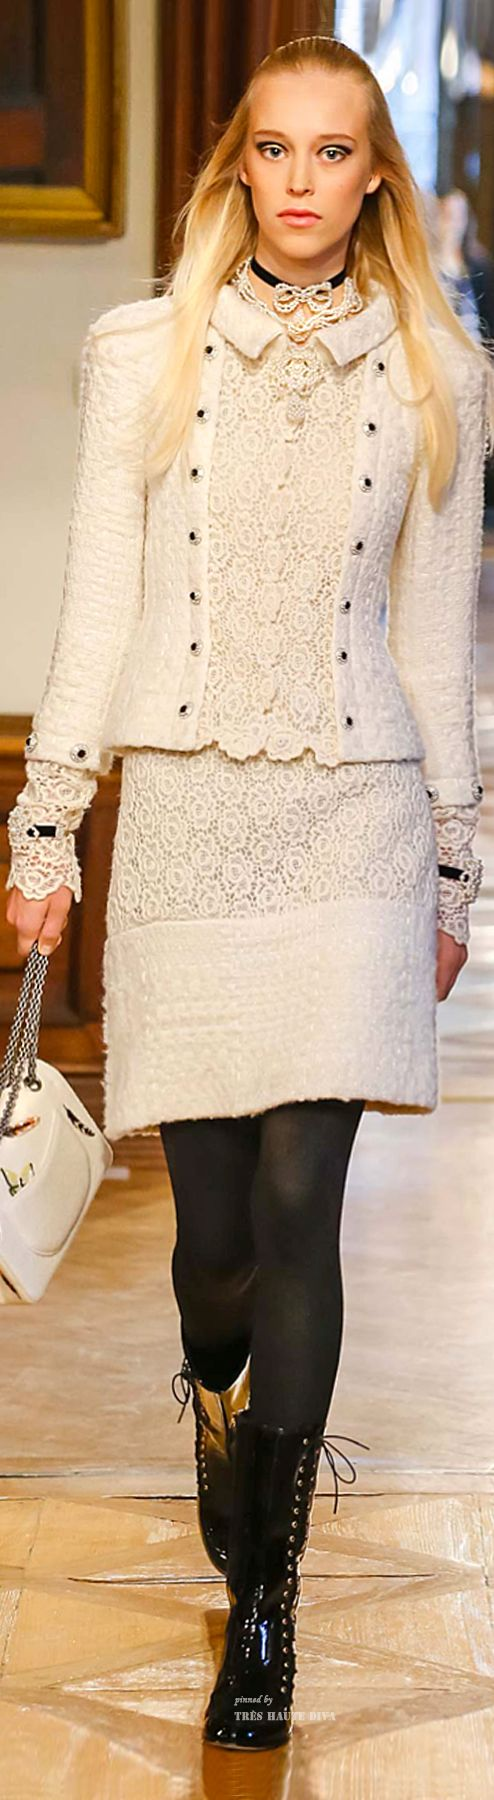 Chanel Pre-Fall 2015 ♔THD♔ Métiers d'Art Show, Salzburg, Austria